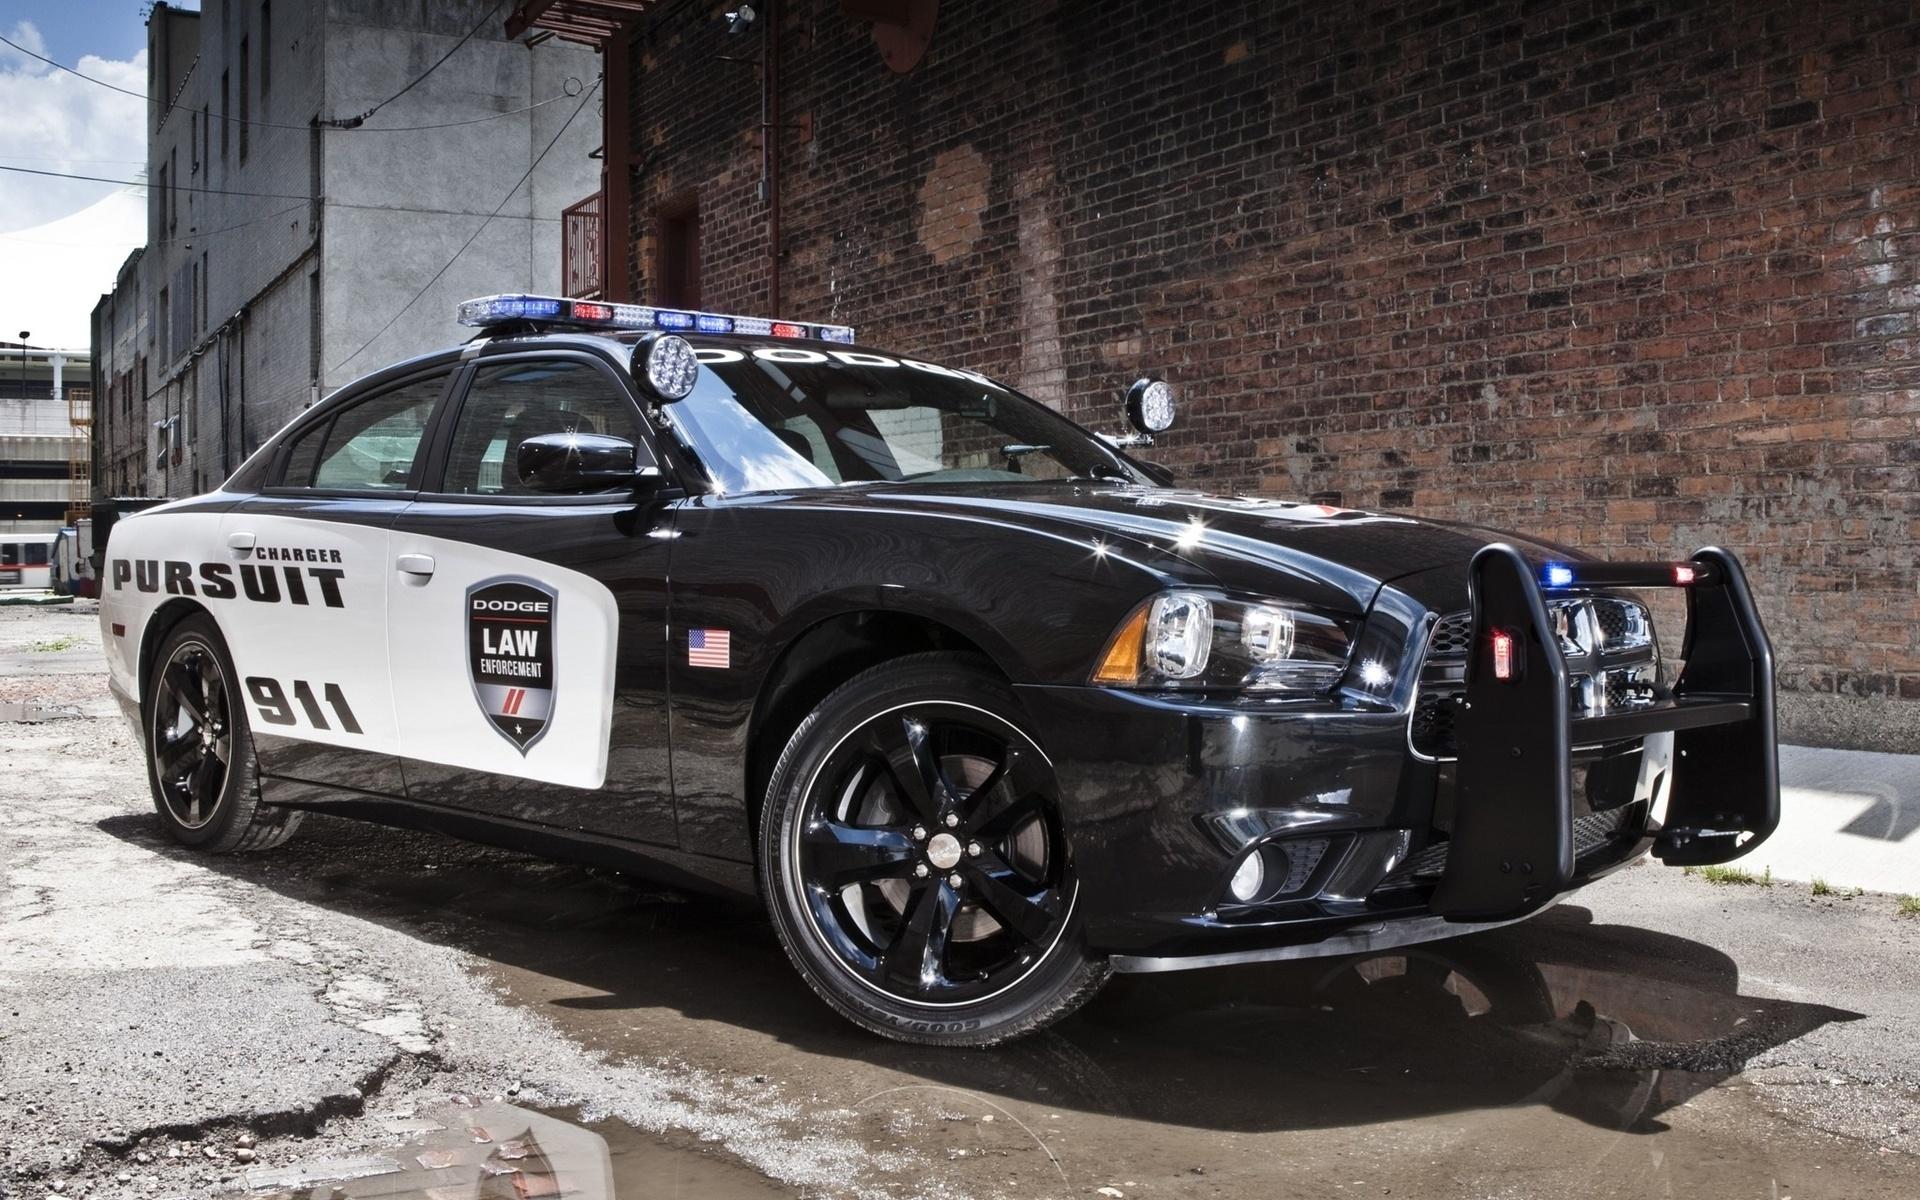 Wallpaper police, car, cool desktop | HD Desktop Wallpapers